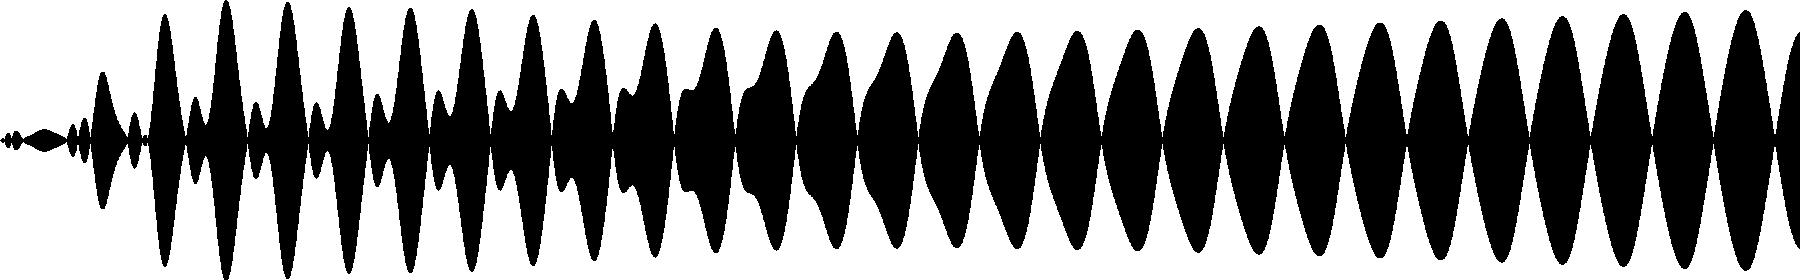 vedh bass cut 048 d